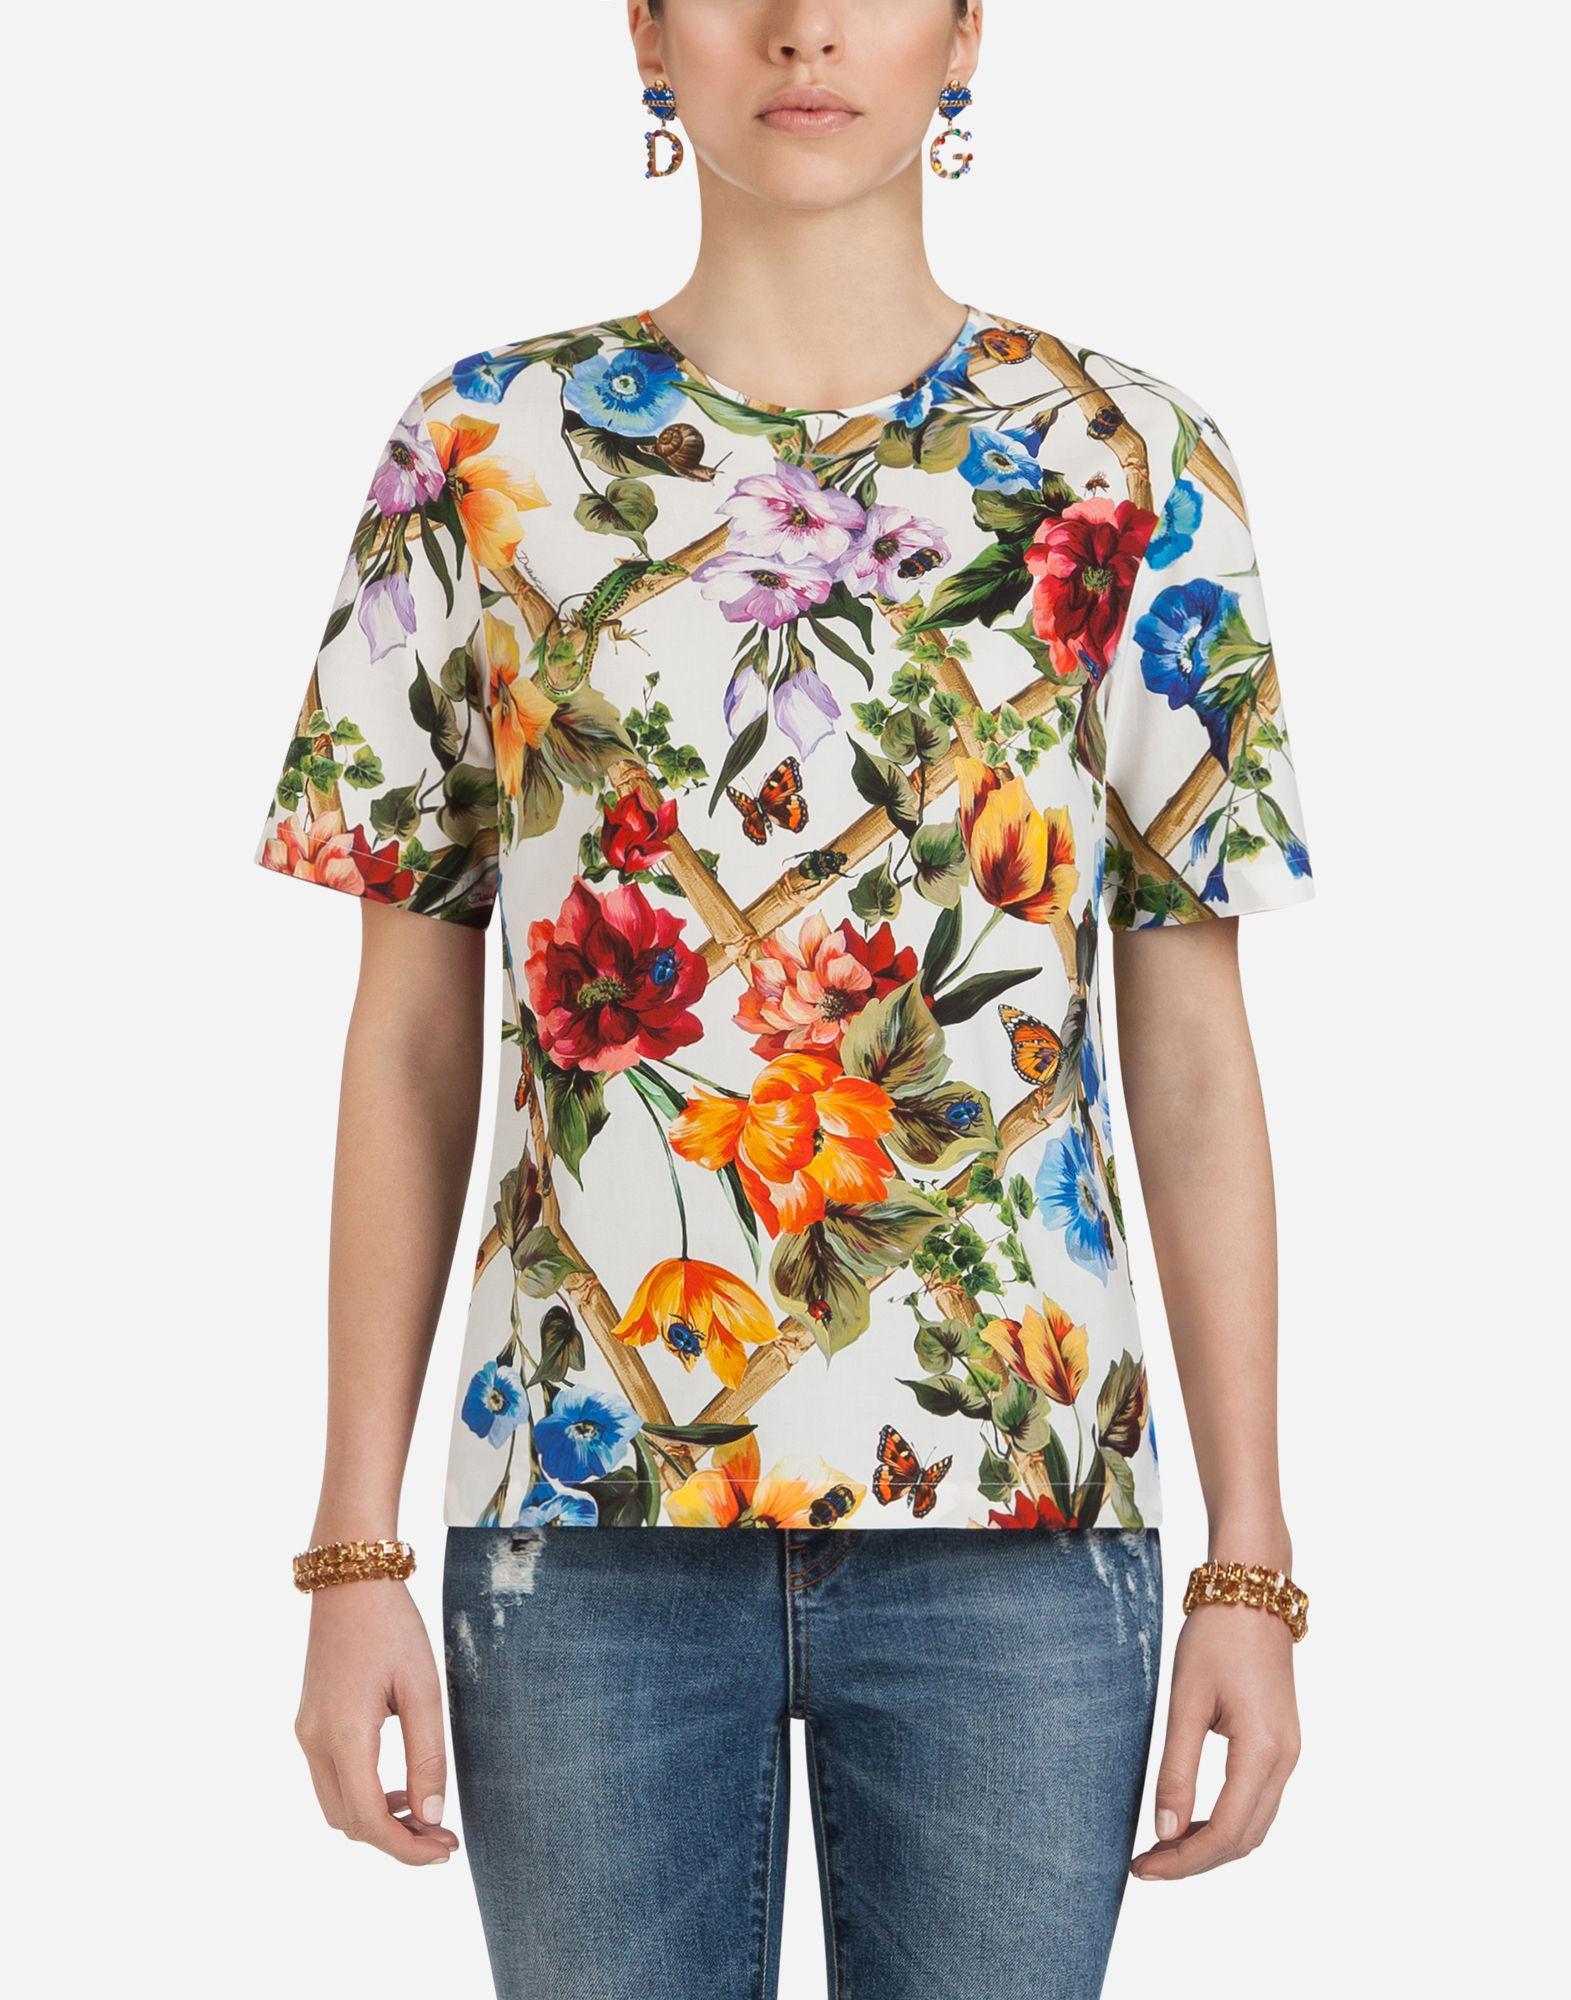 Dolce & Gabbana Printed Cotton Top In Multicolor